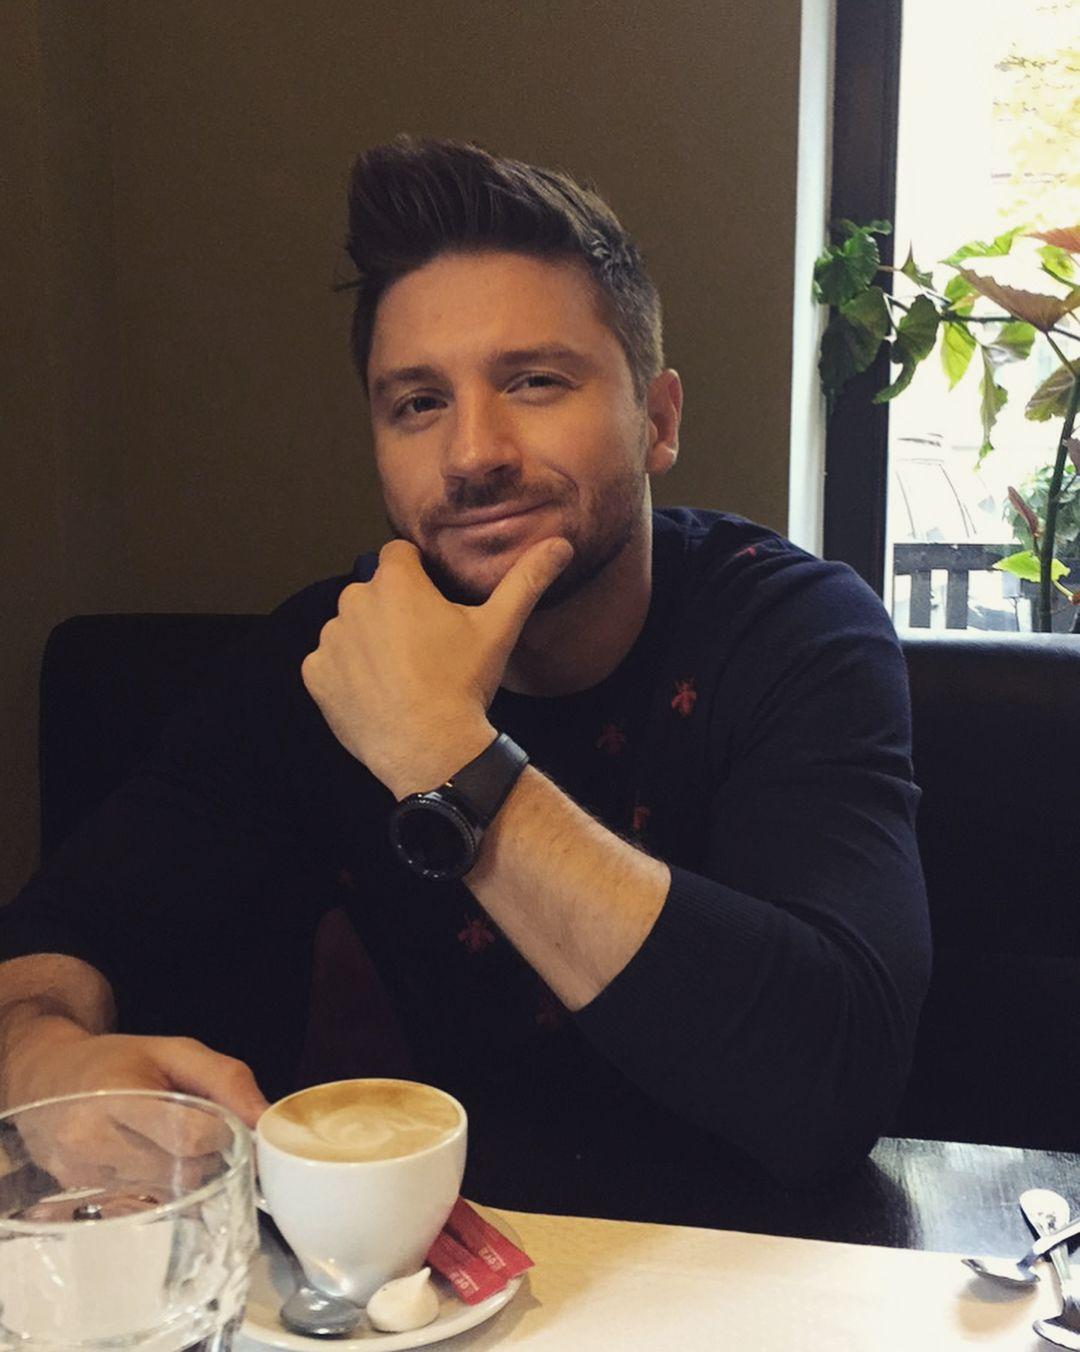 Сергей Лазарев поведал о наклонностях сына | StarHit.ru